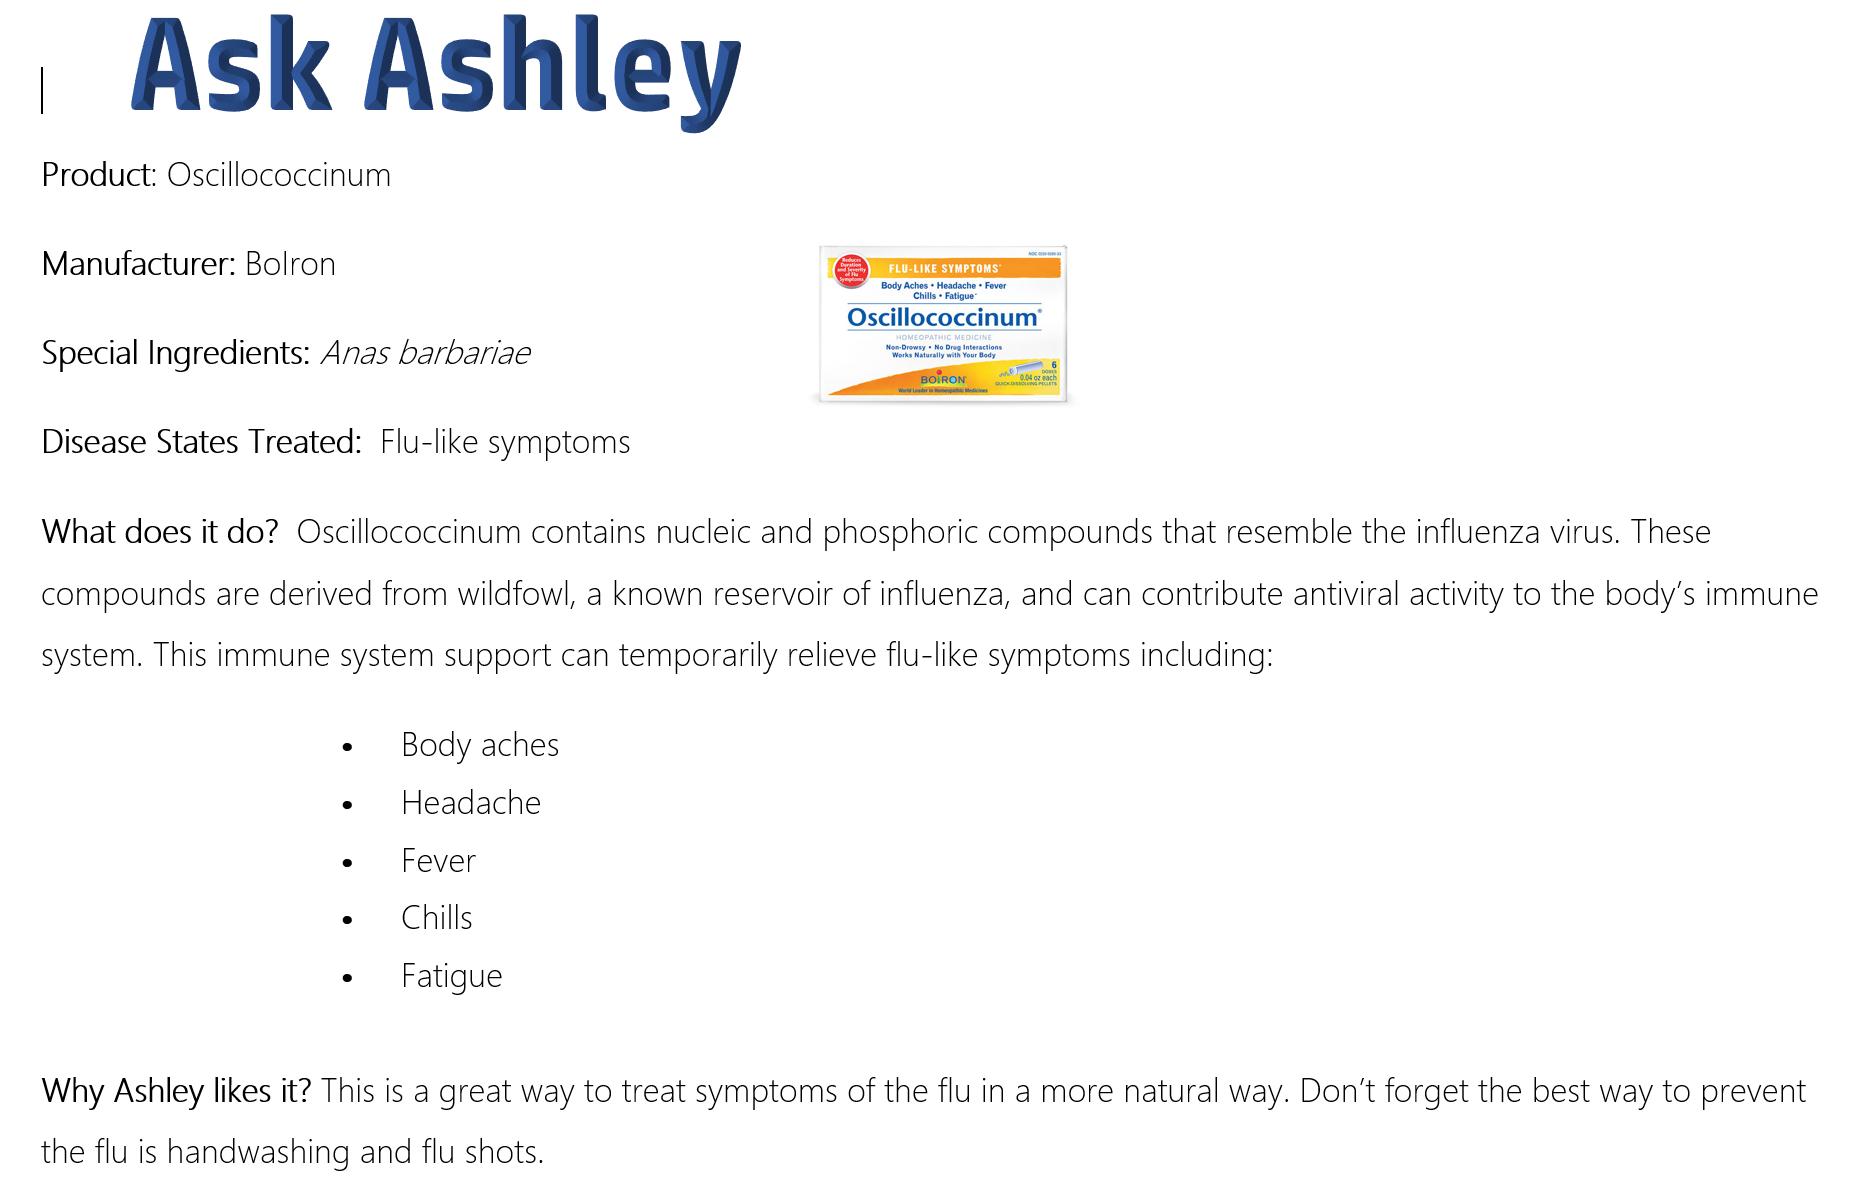 Ask Ashley-Oscillococcinum.png